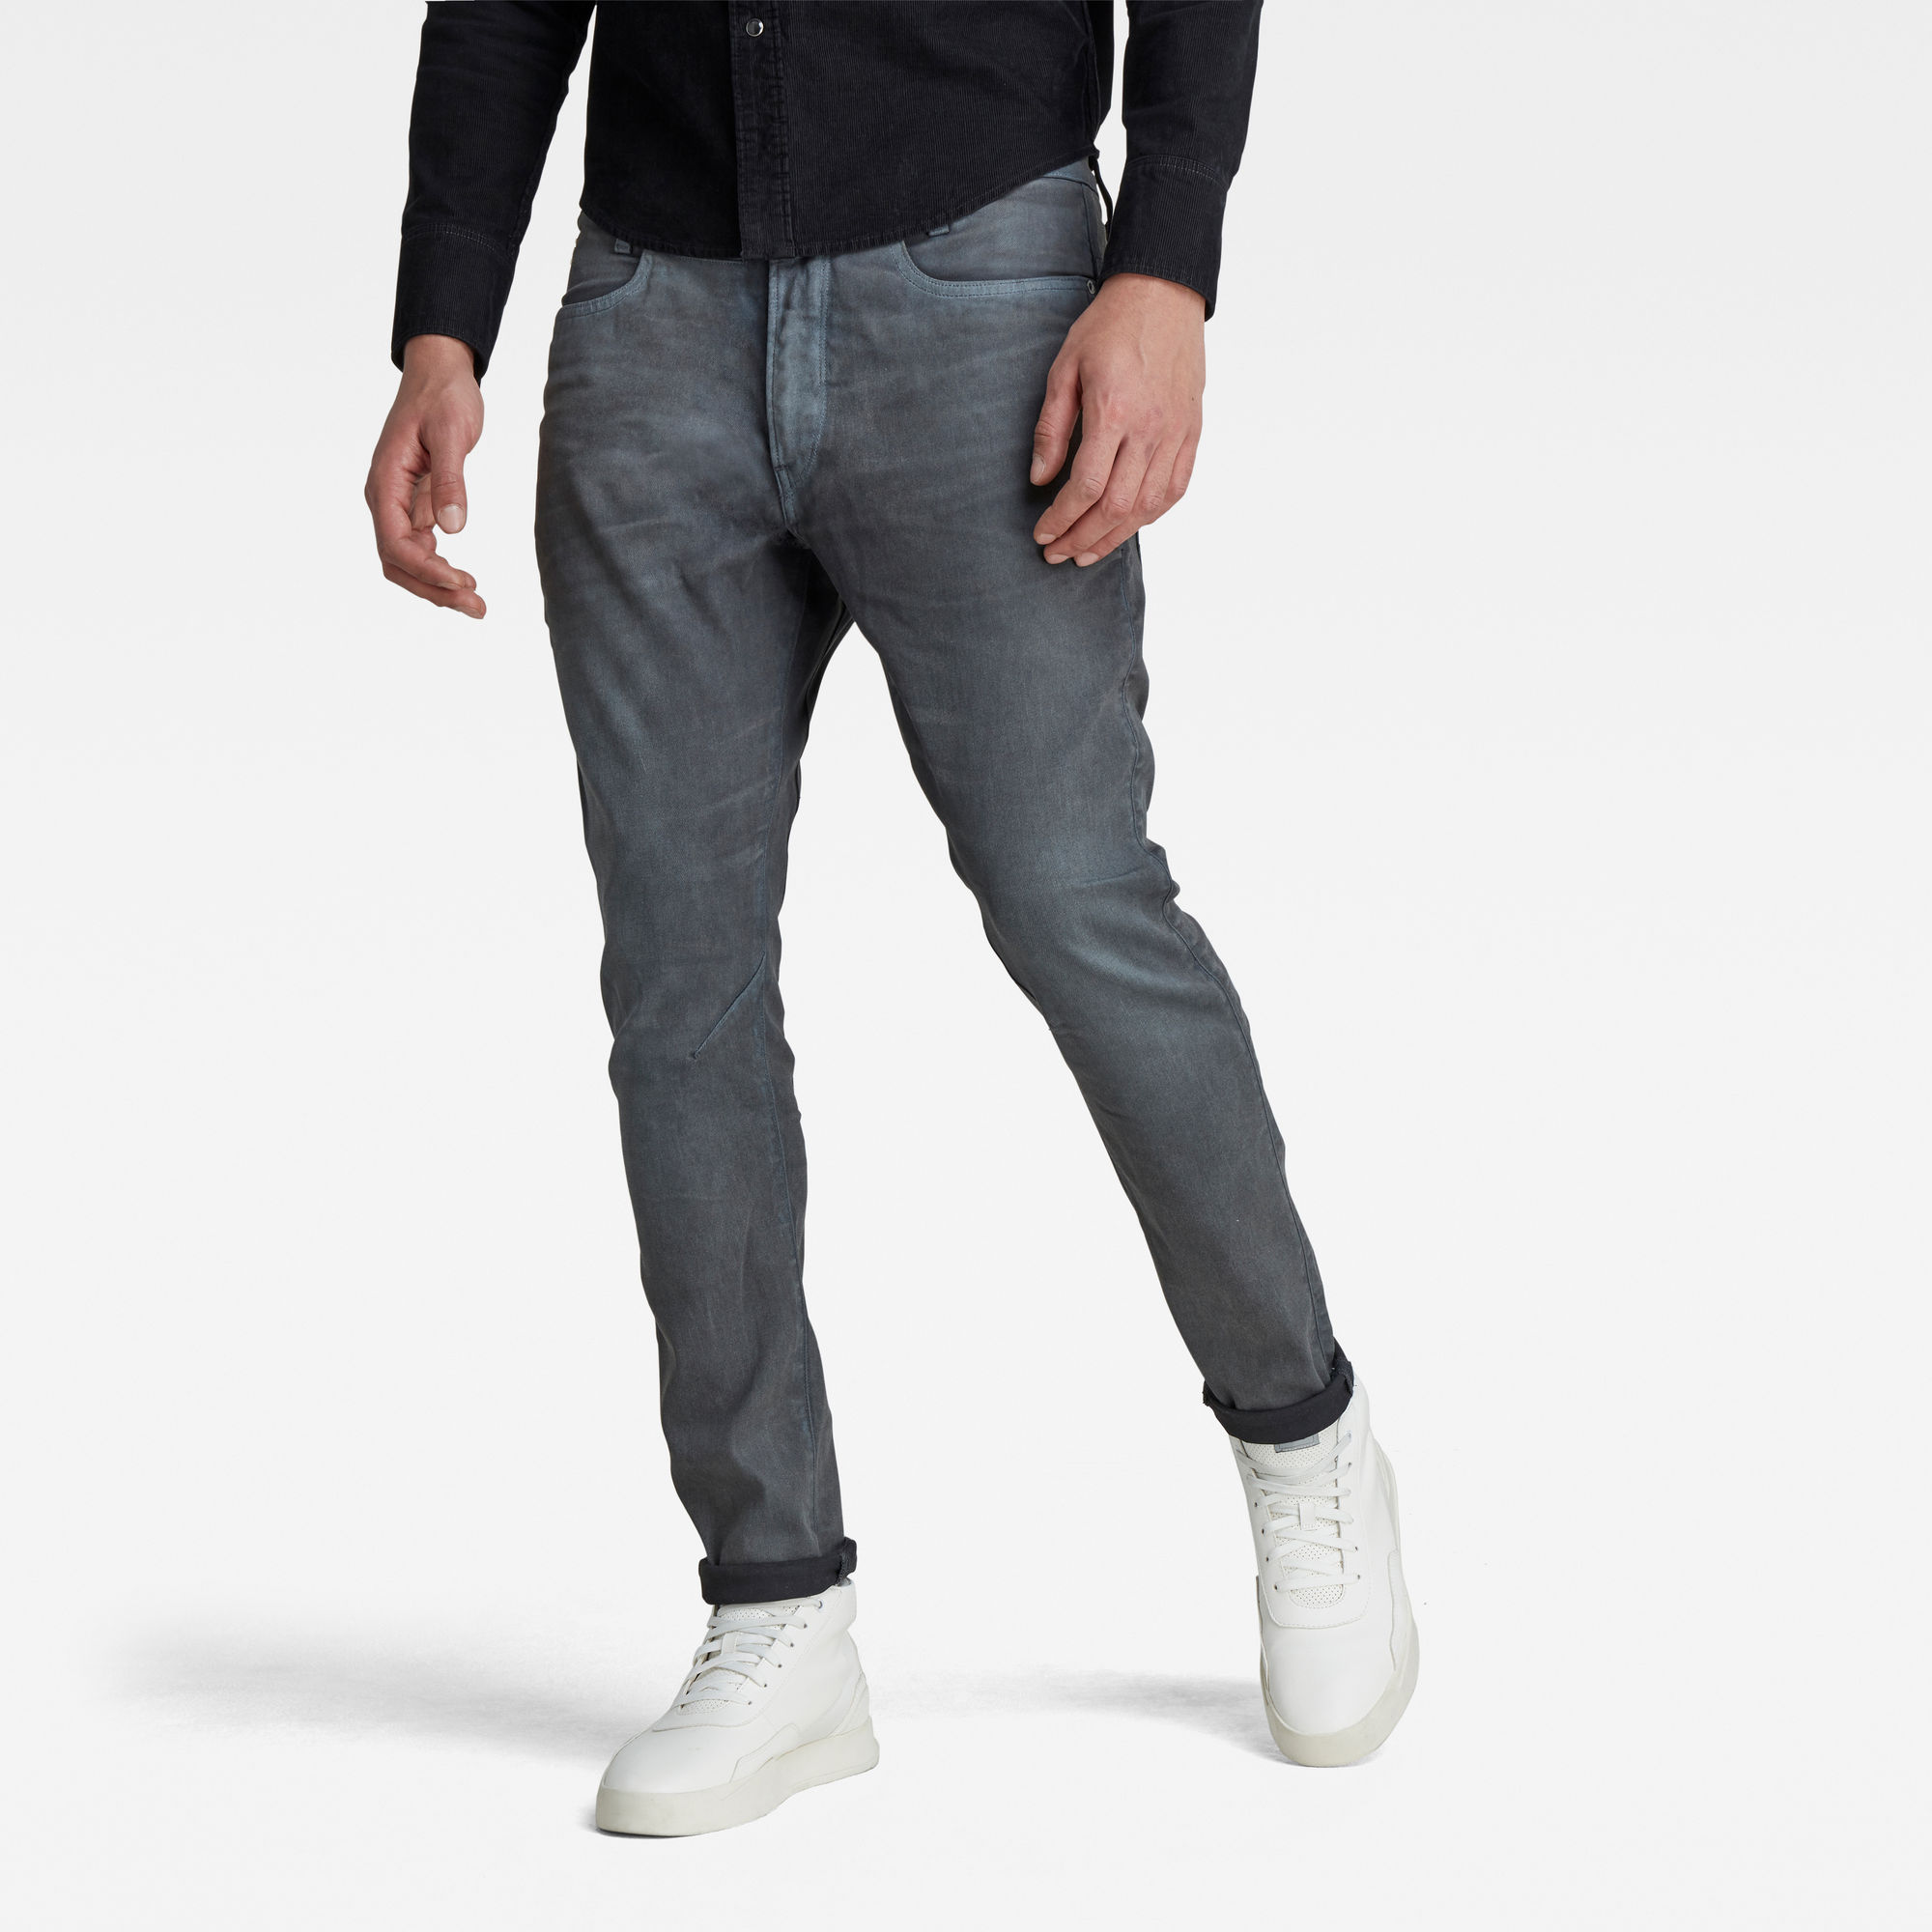 Van G Star Raw D-Staq 3D Skinny Jeans Prijsvergelijk nu!